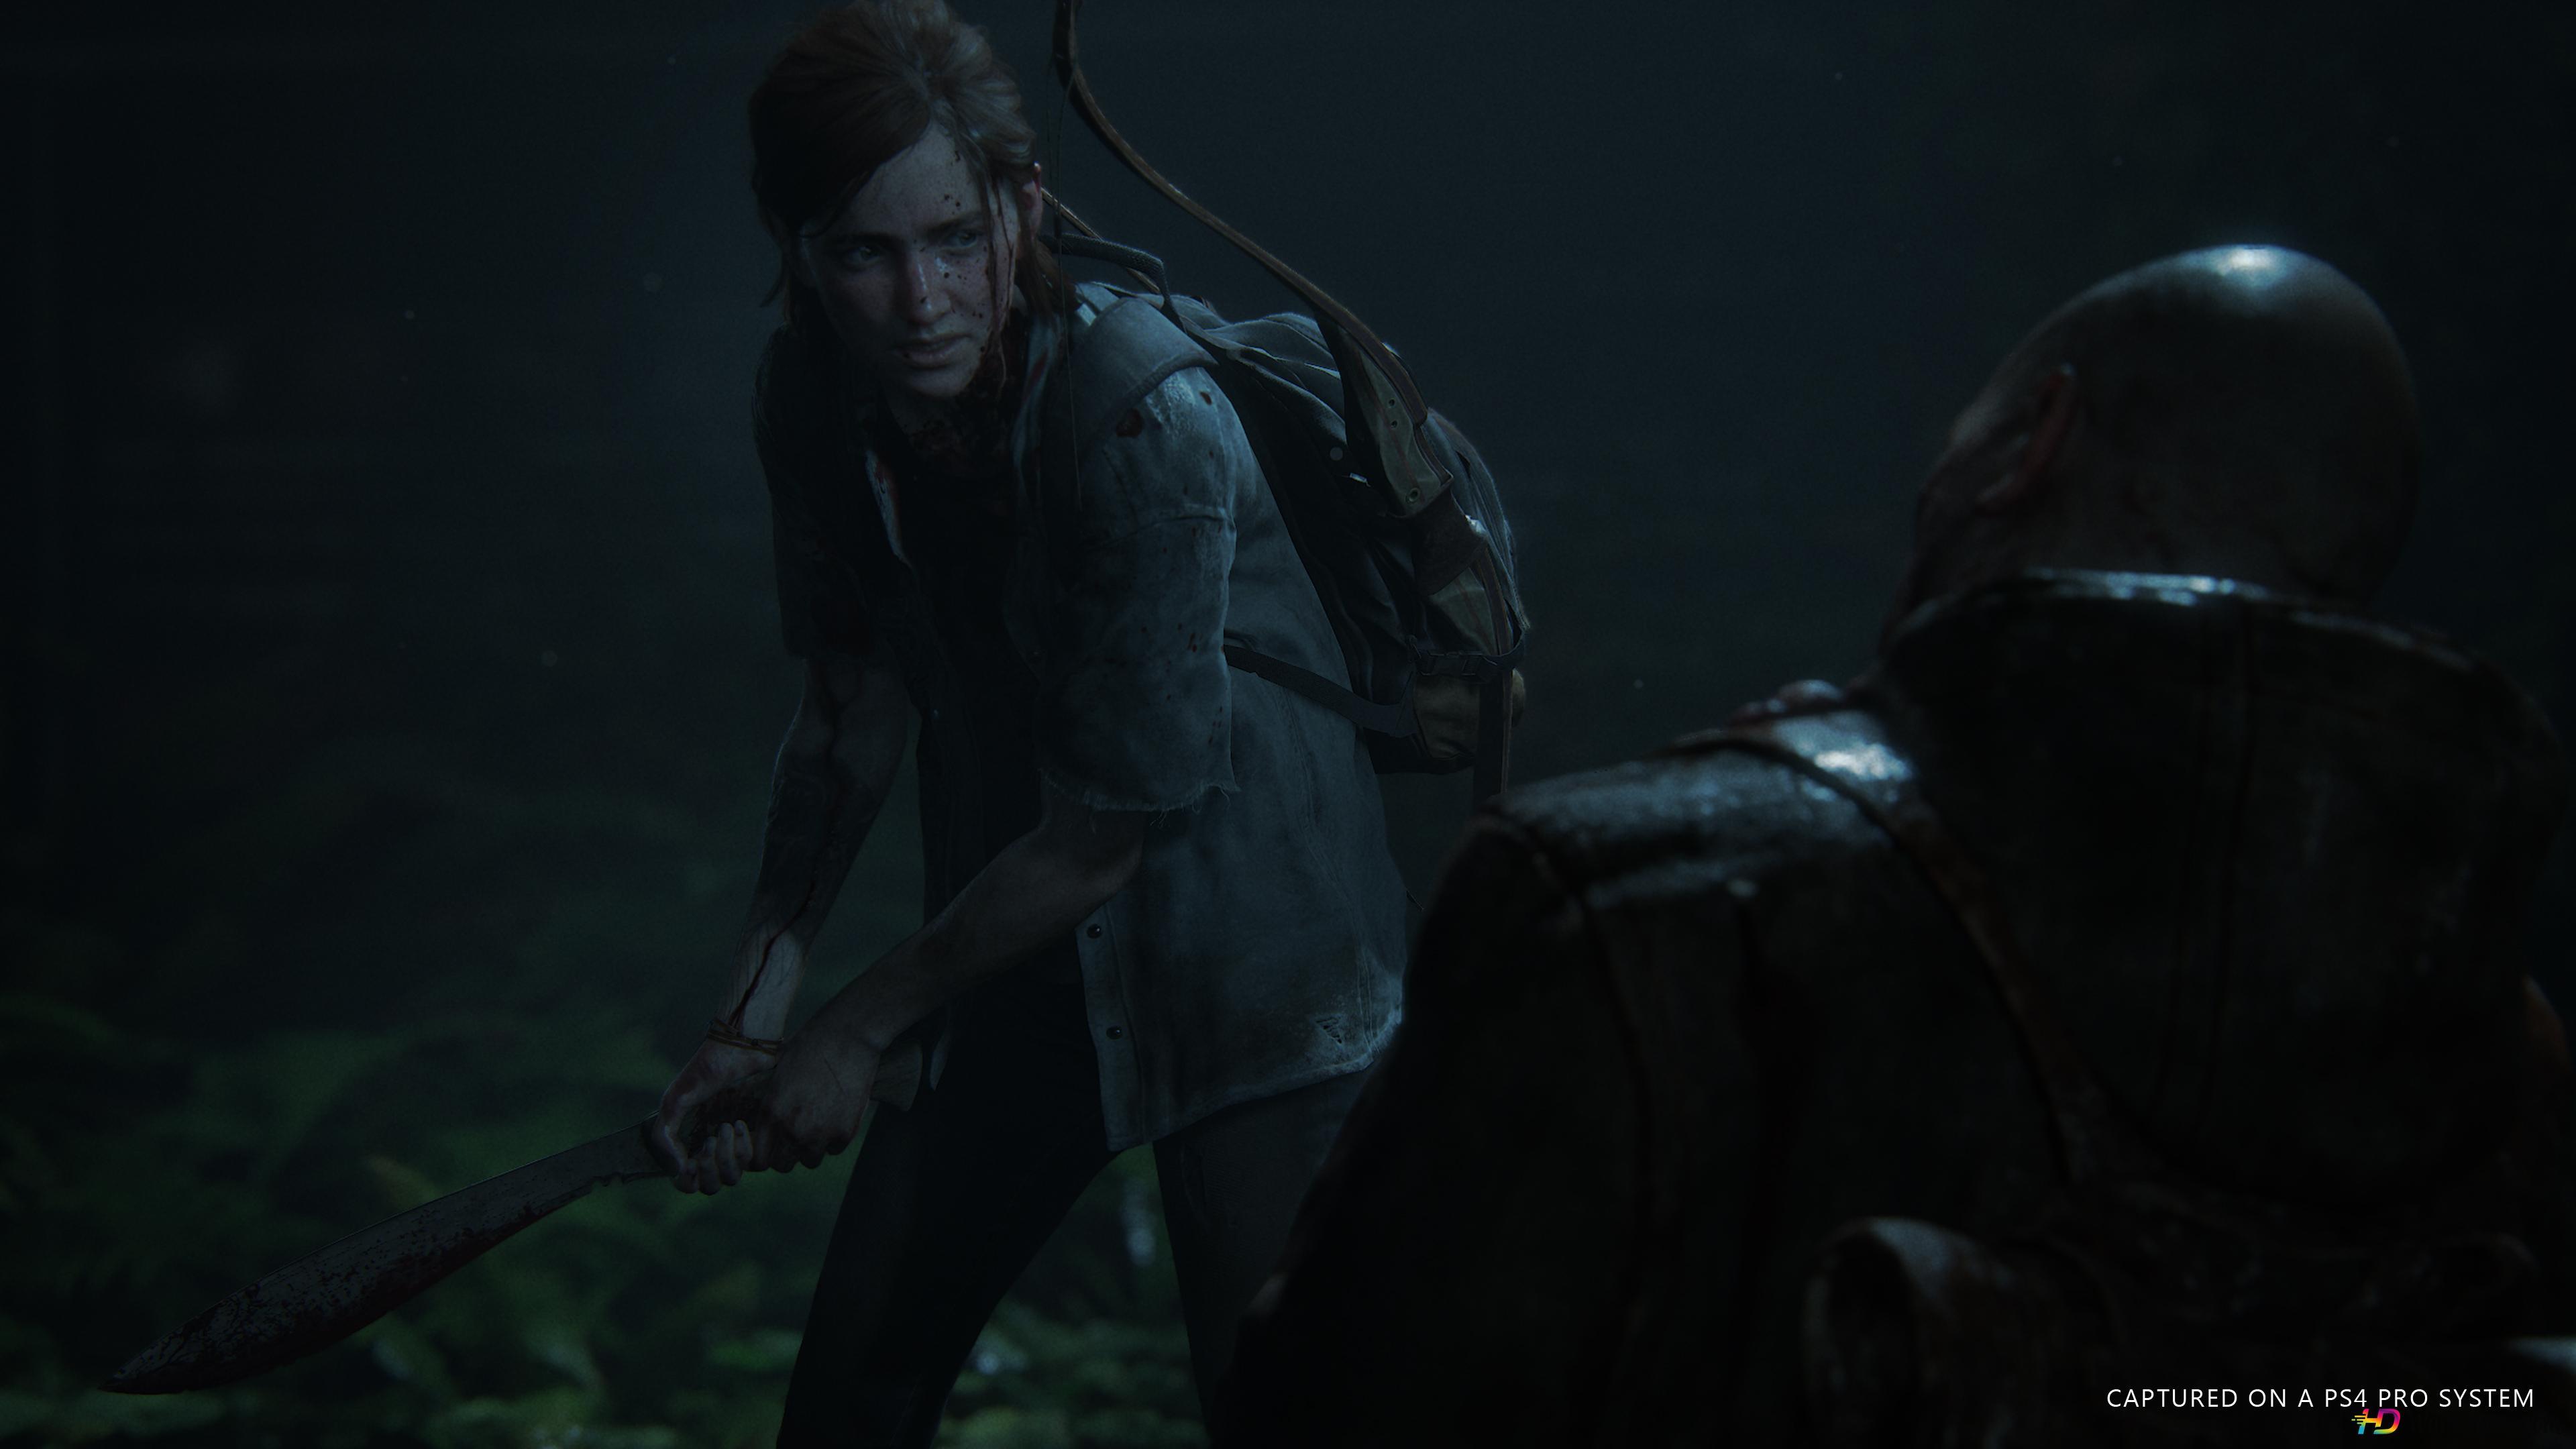 Ellie The Last Of Us Hd Wallpaper Download